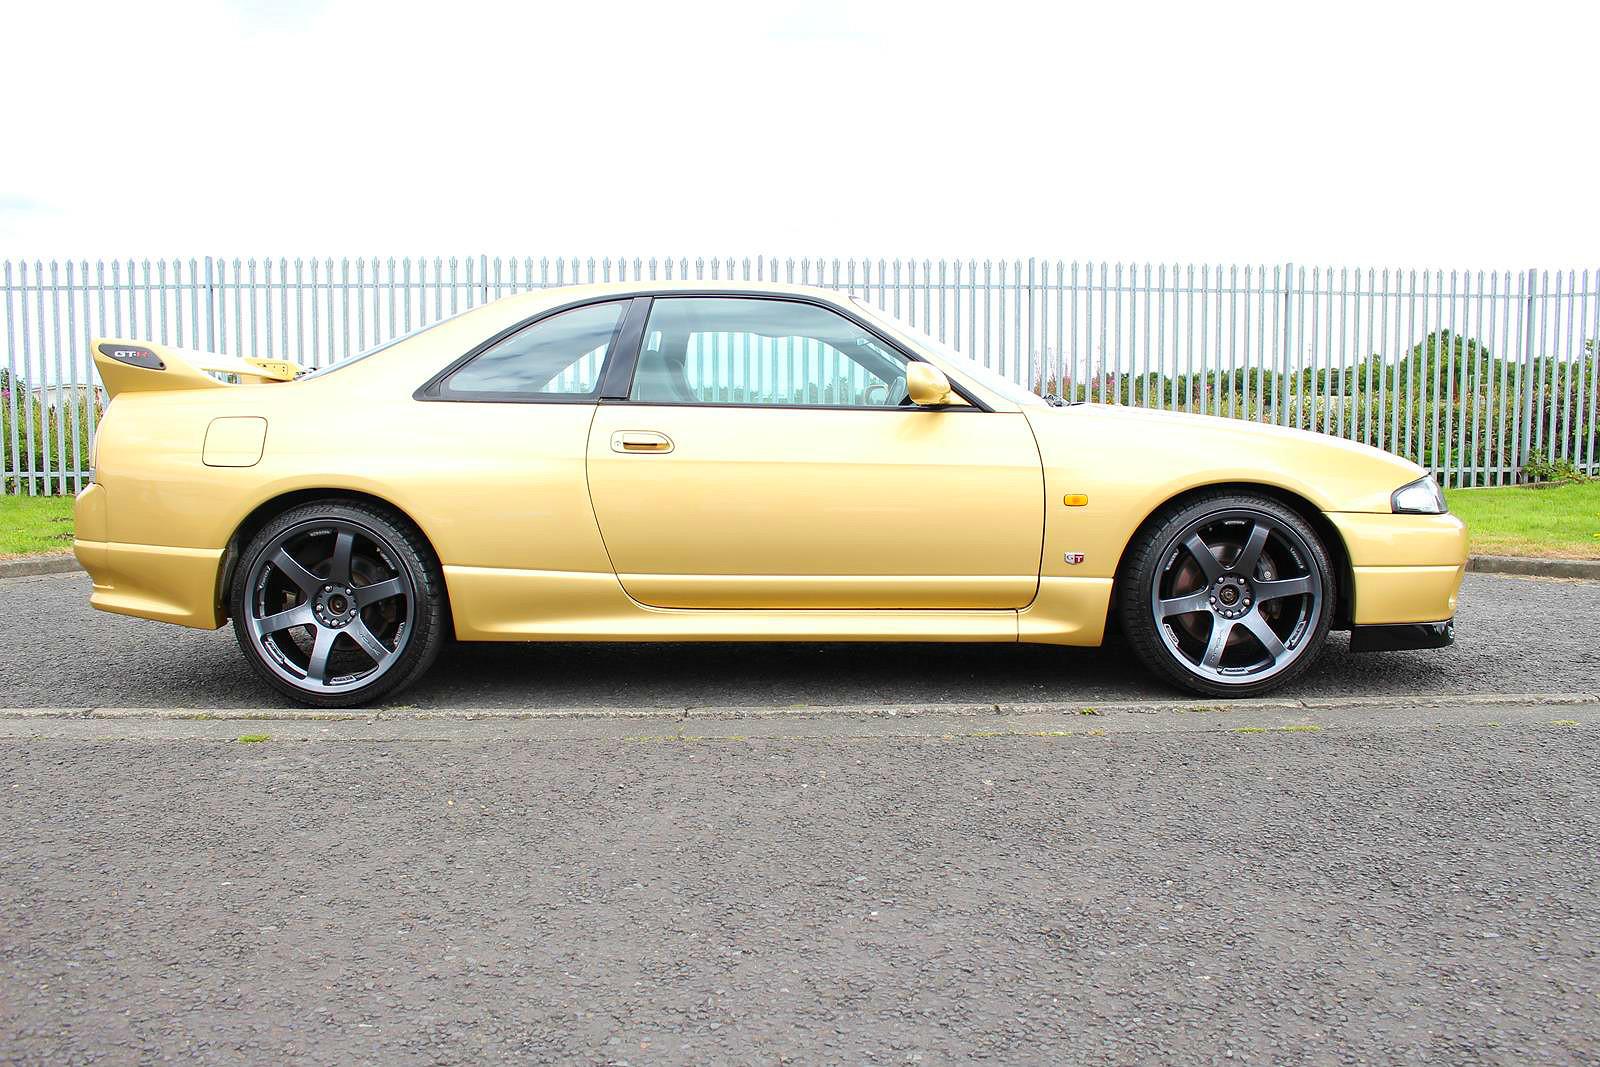 1995 Nissan Skyline R33 Gtr Top Secret Gold